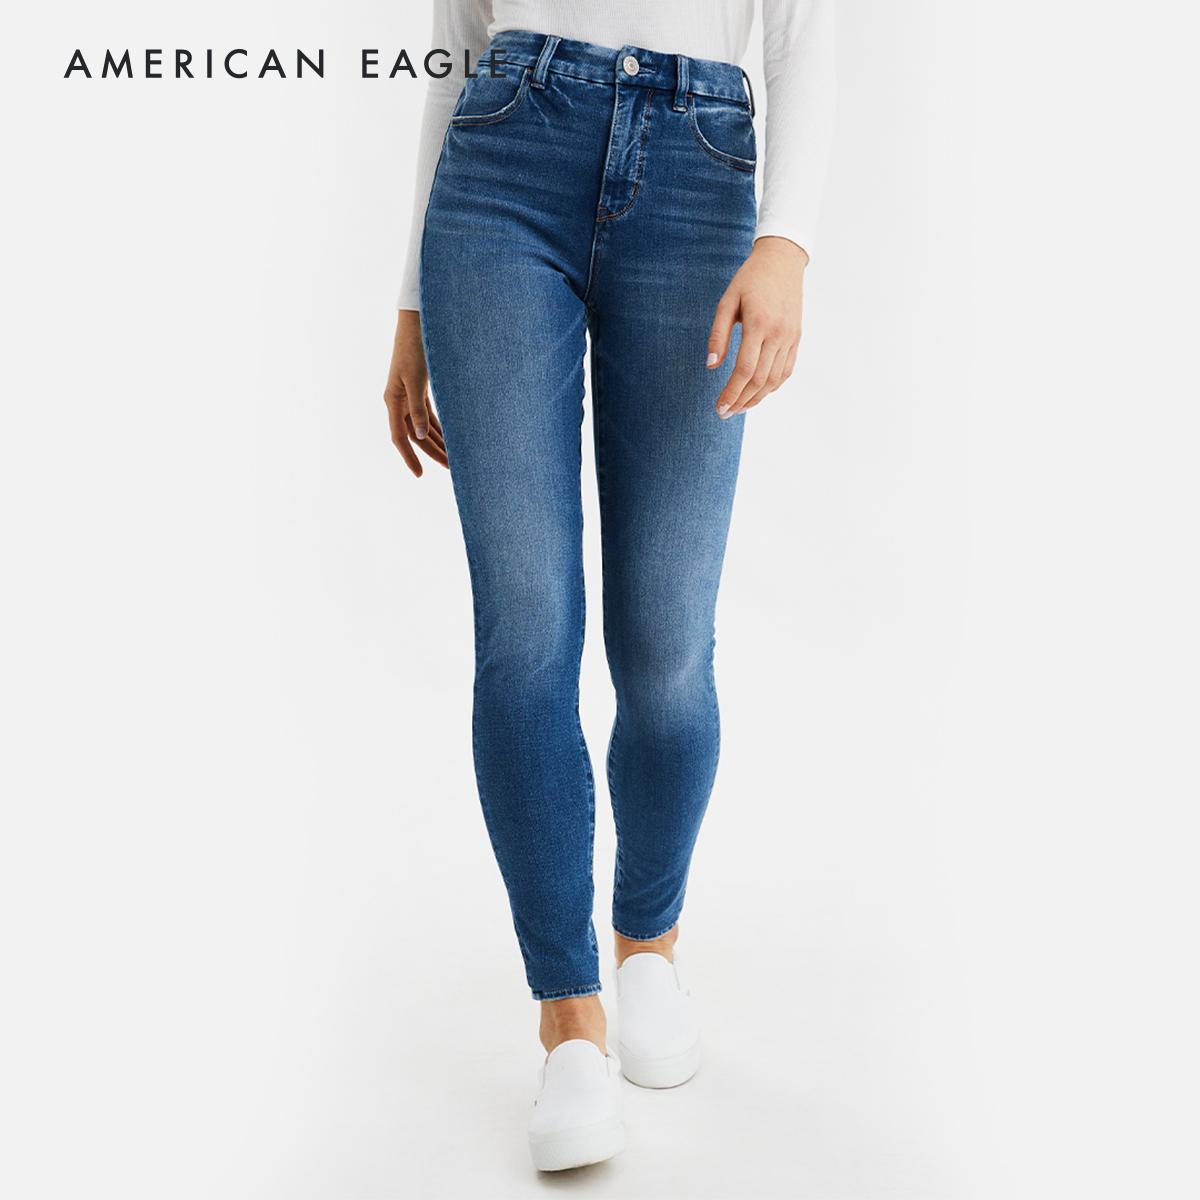 American Eagle The Dream Jean Curvy High-Waisted Jegging กางเกง ยีนส์ ผู้หญิง ดรีมยีนส์ เคิร์ฟวี่ เอวสูง (ความยาวแบบสั้น)(043-2429-851).